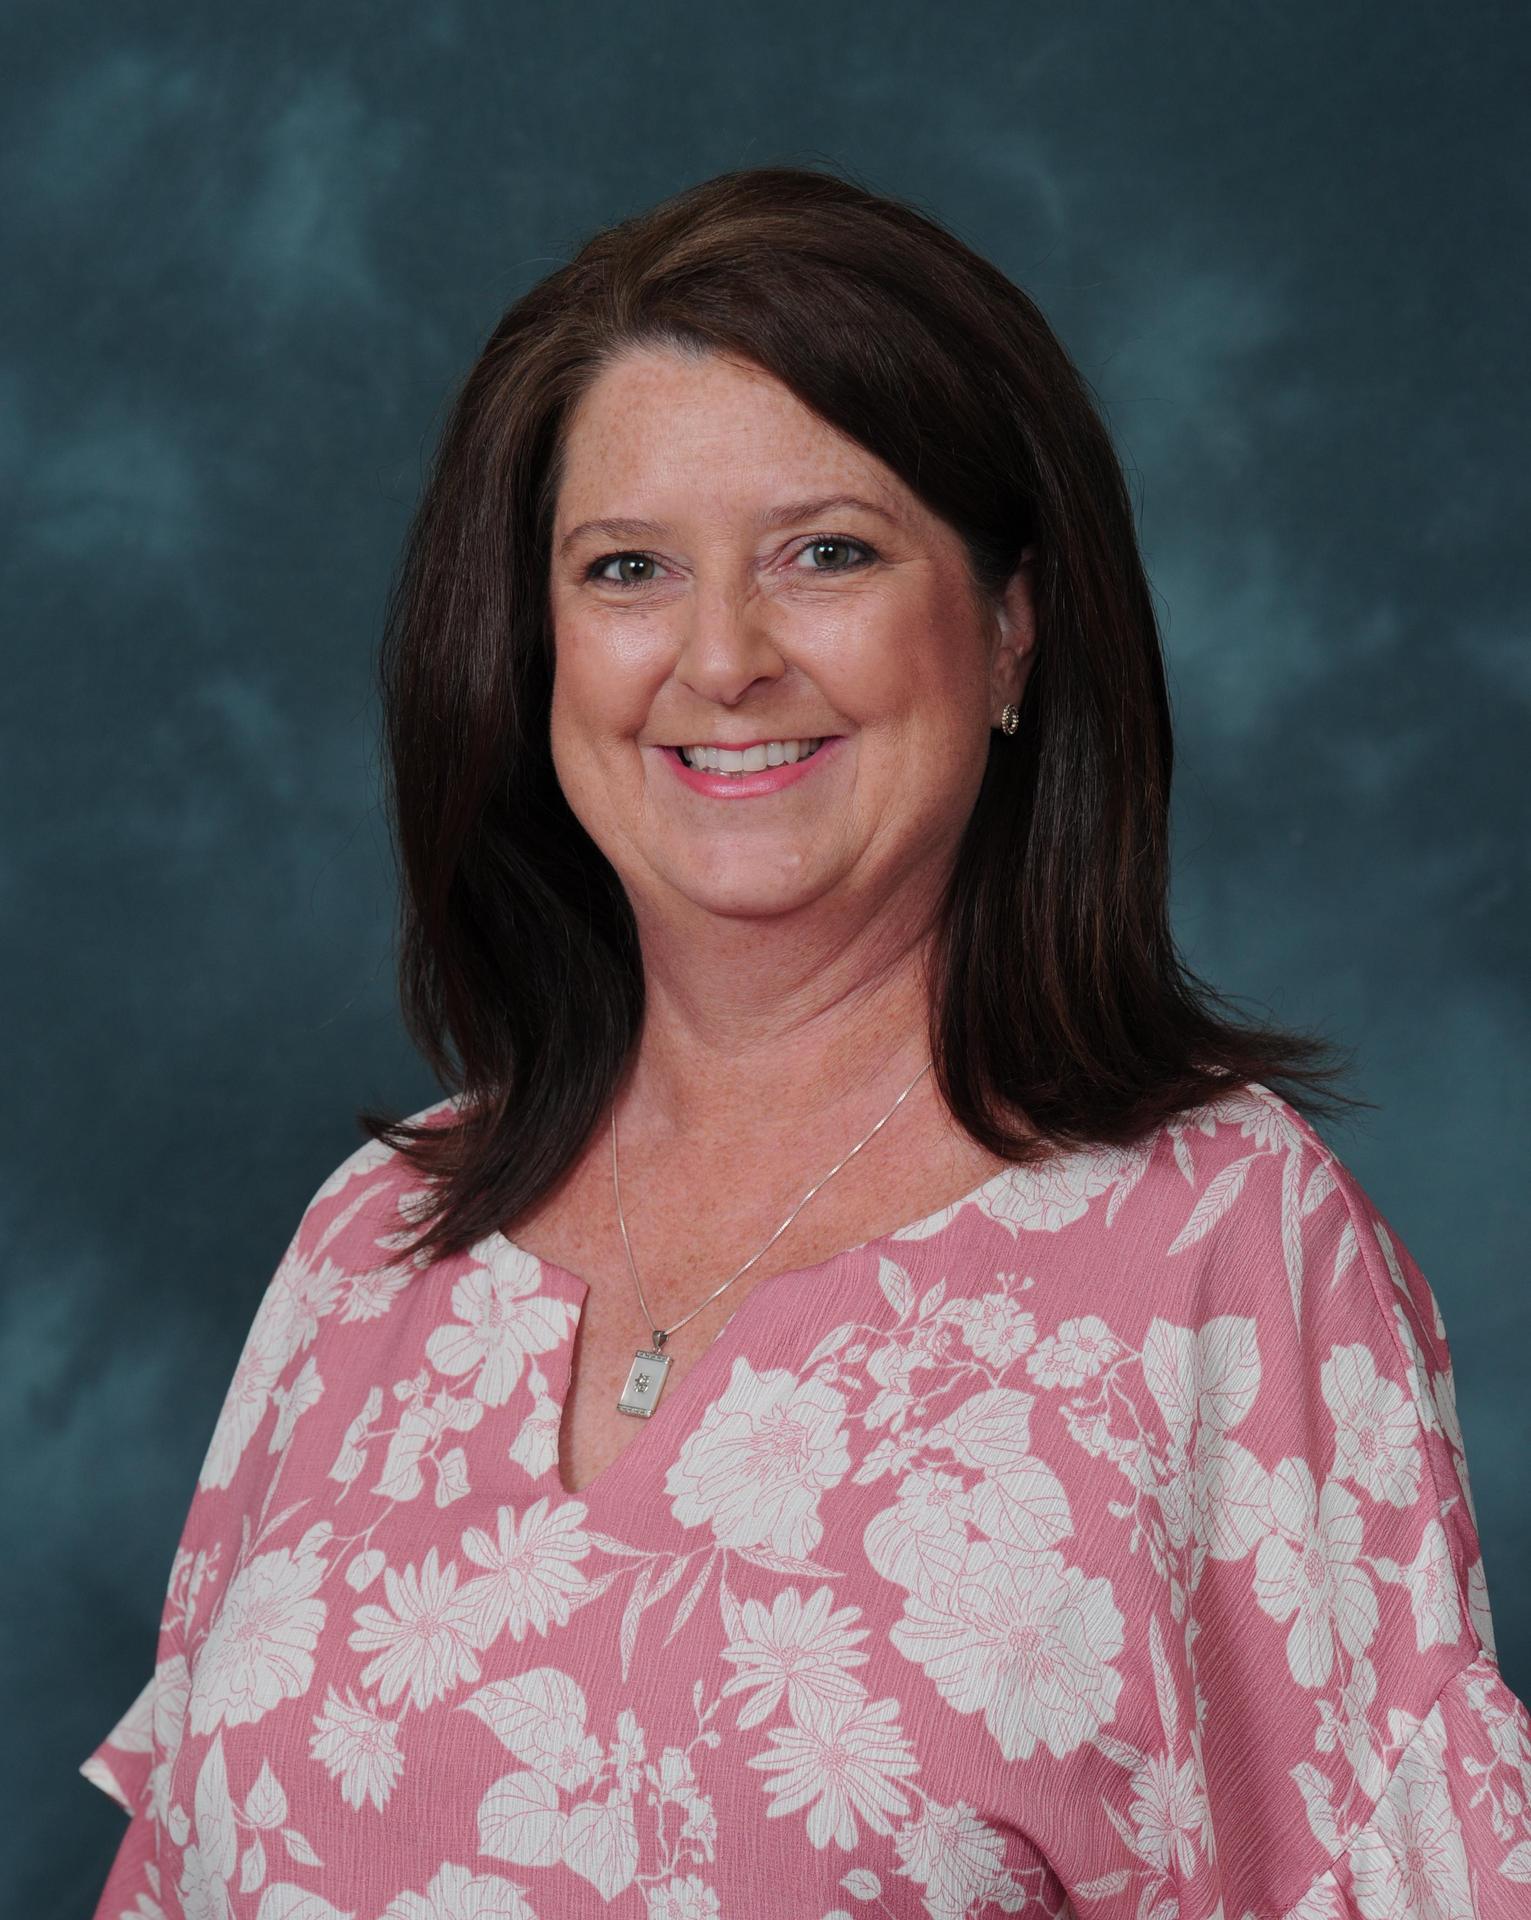 Sharon Storey, Executive Administrative Assistant